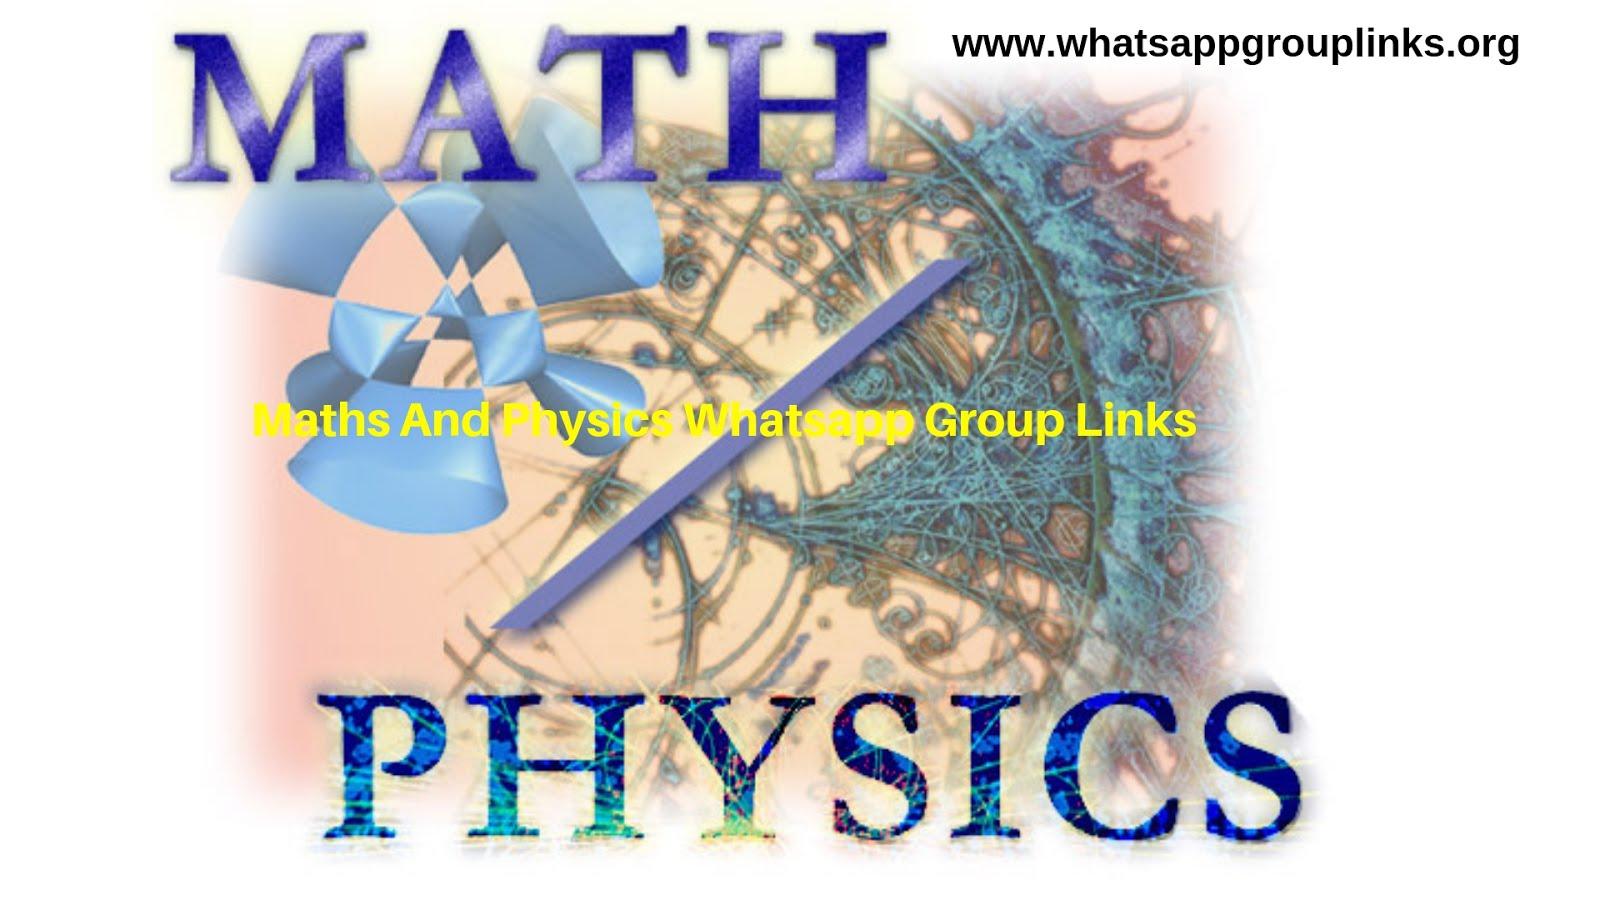 Join Maths And Physics Whatsapp Group Links List - Whatsapp